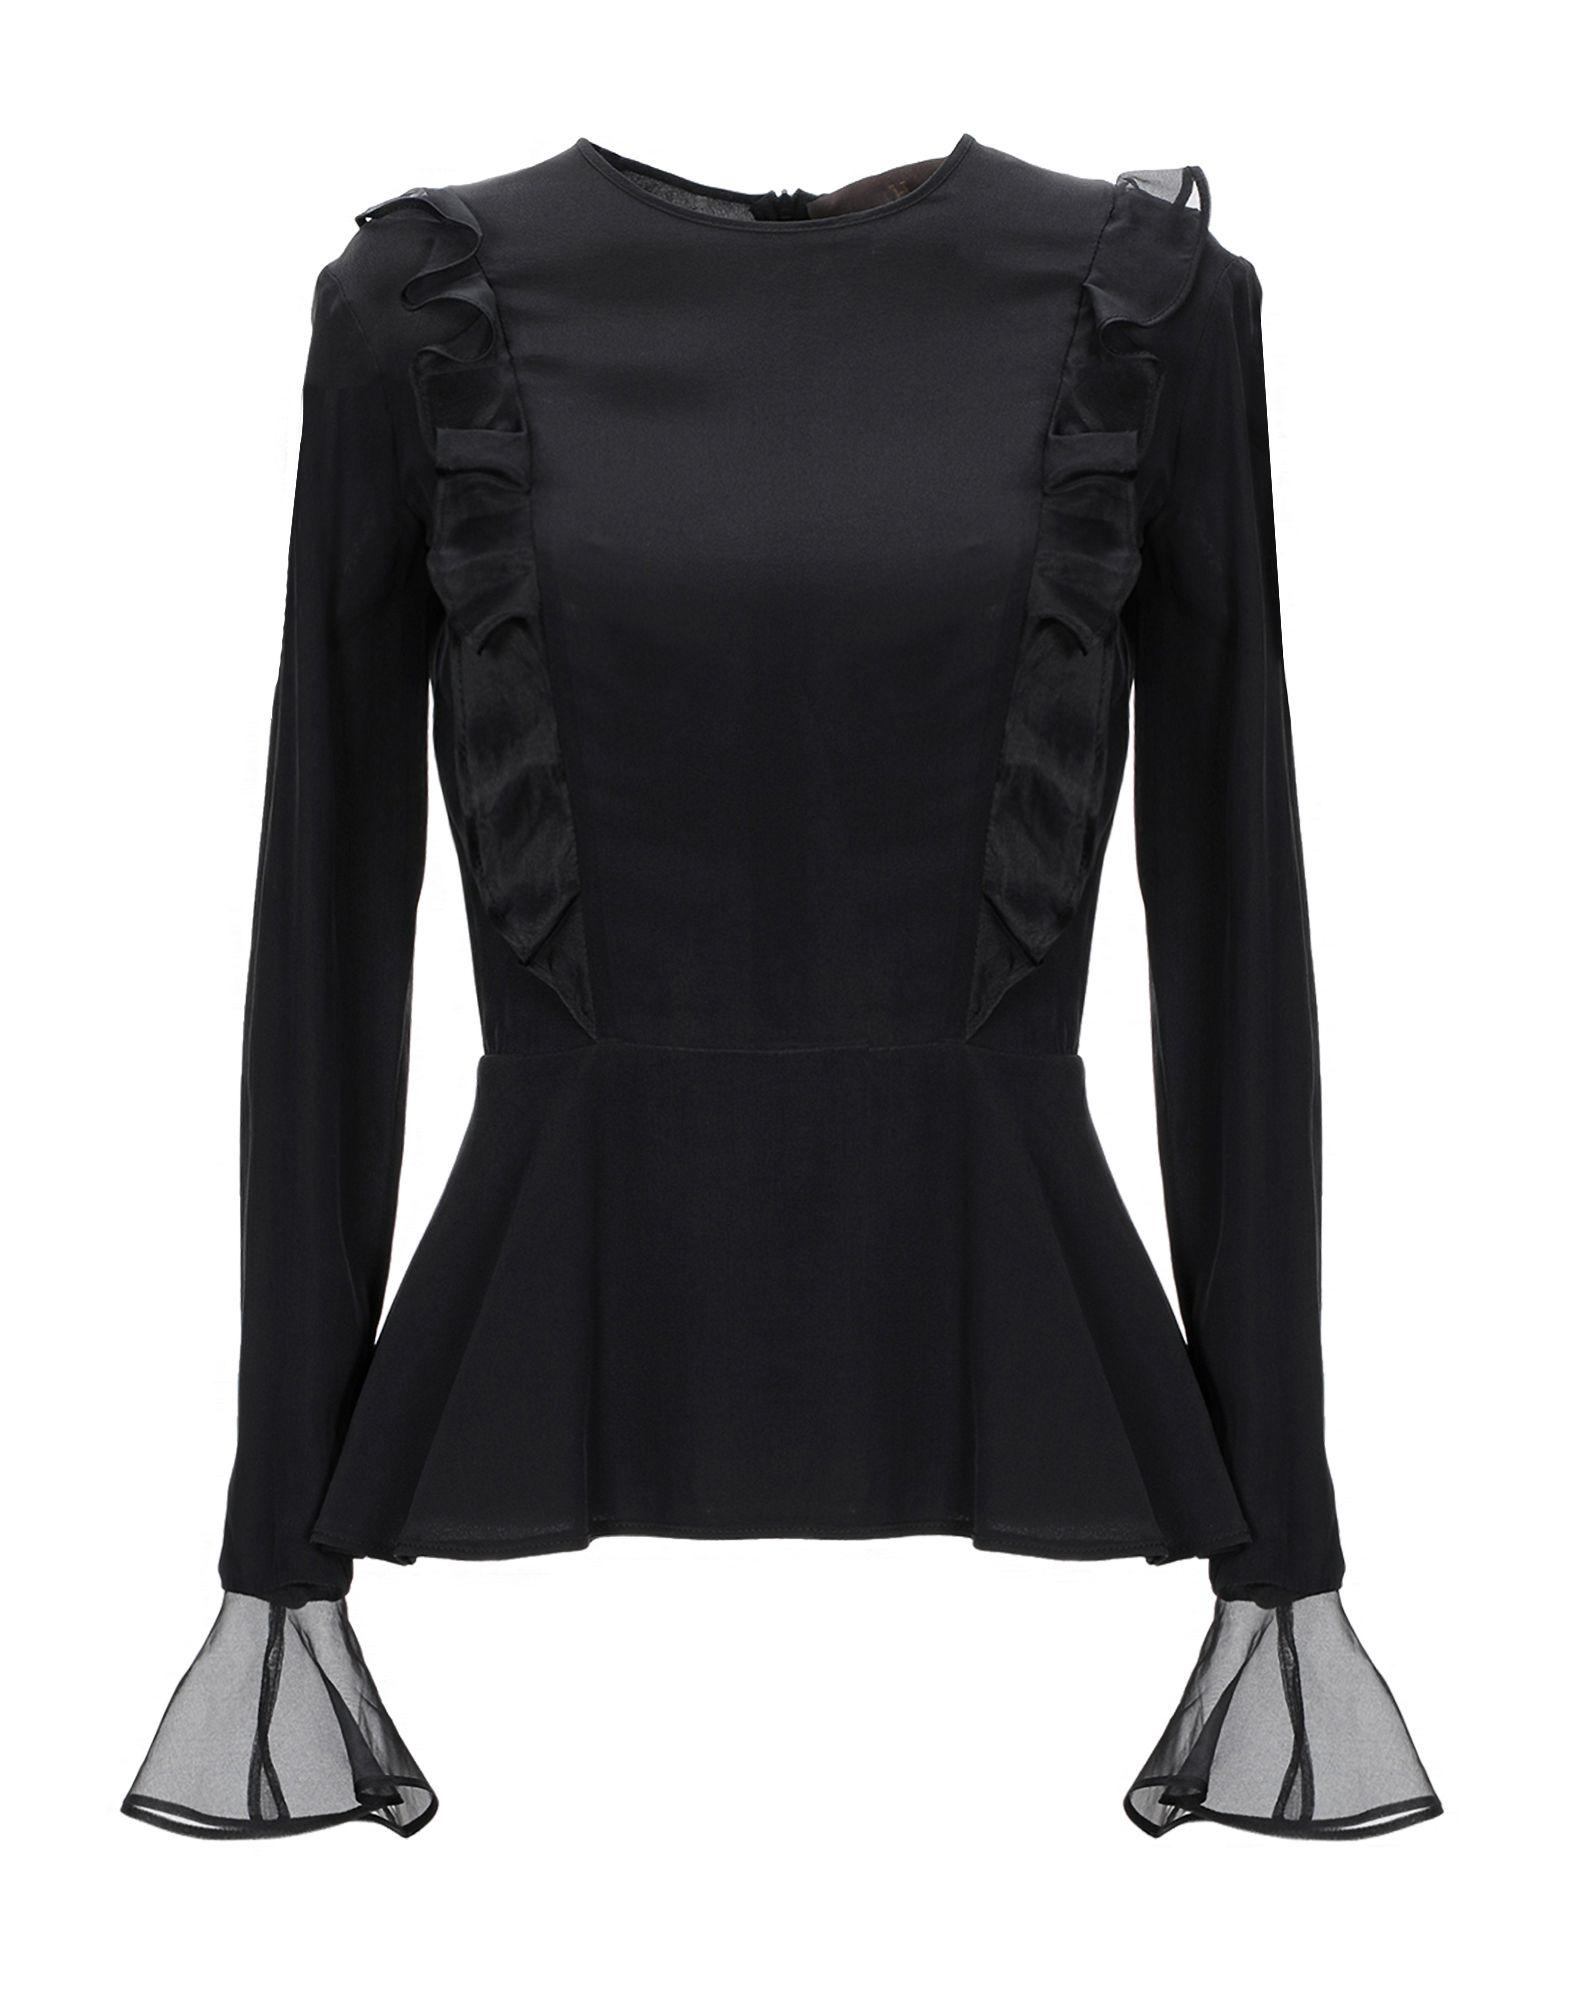 Фото - SPACE STYLE CONCEPT Блузка space style concept блузка